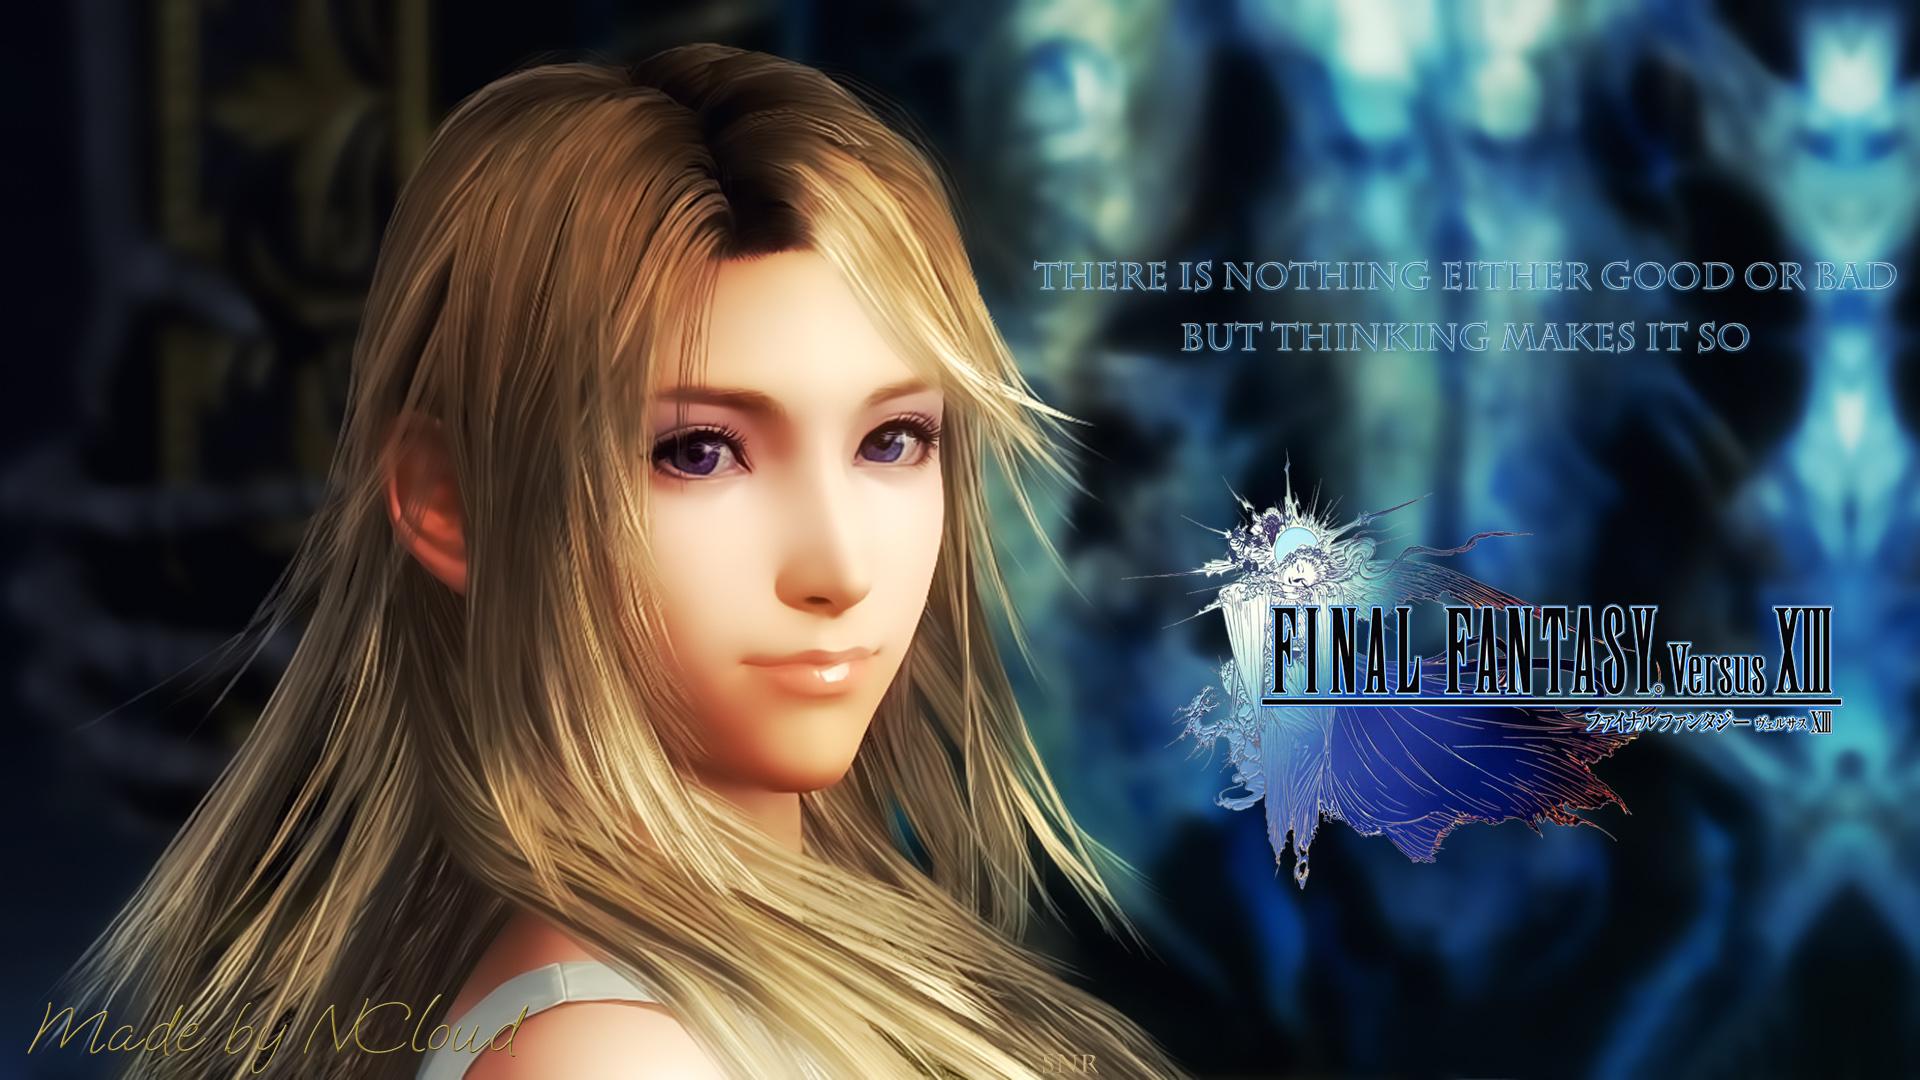 Final Fantasy 15 Stella wallpaper - 620212